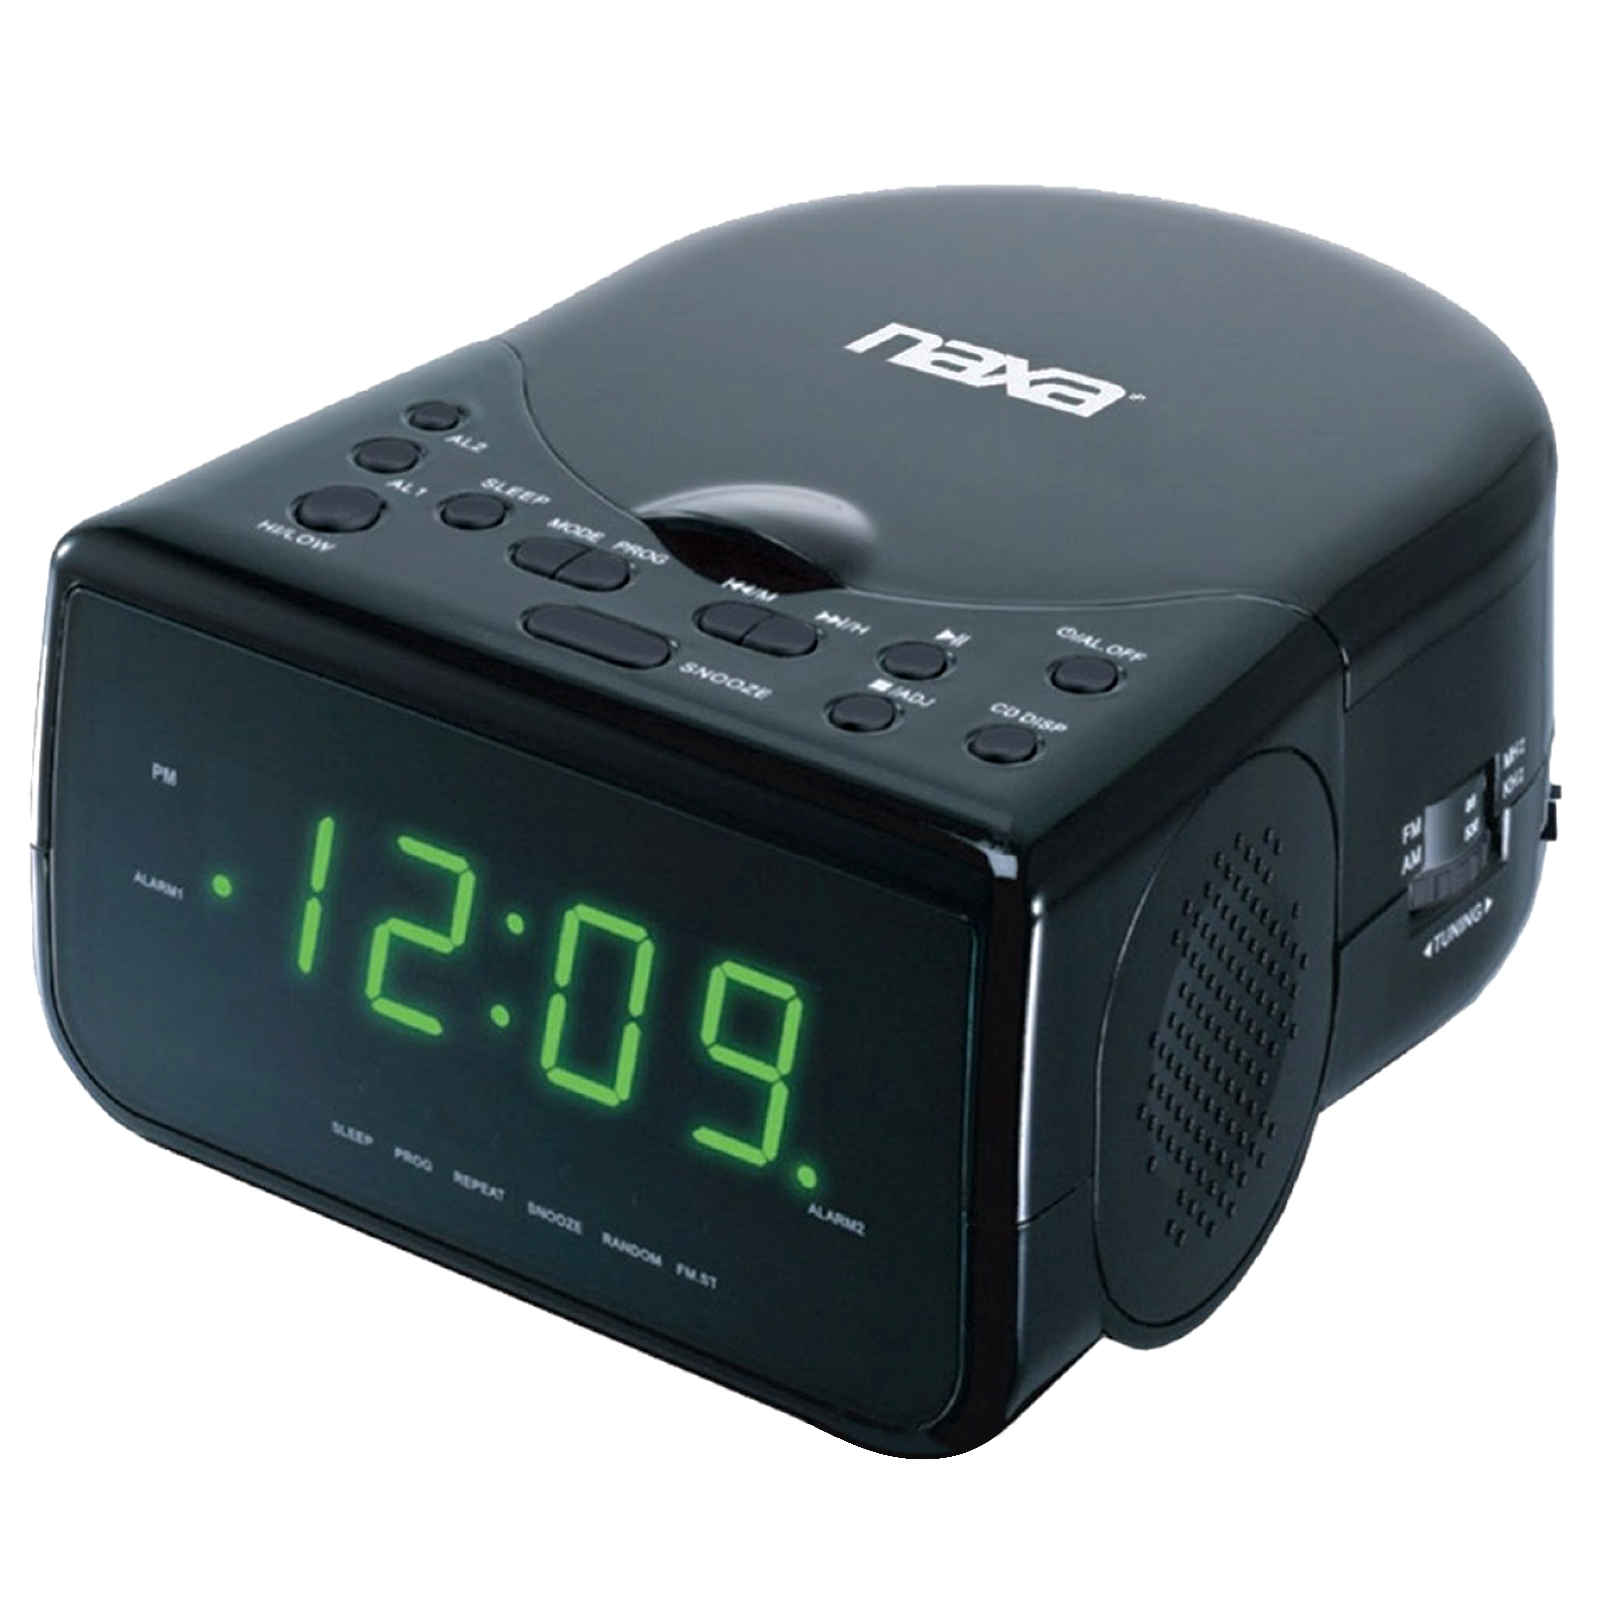 Alarm colck radio with CD player